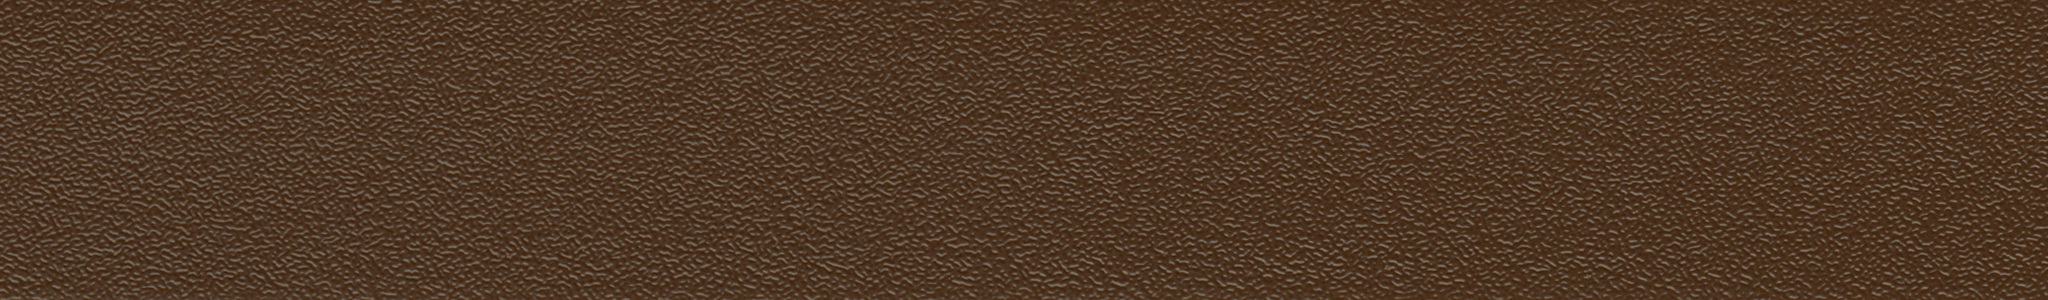 HU 18185 ABS Kante UNI Braun perl 101